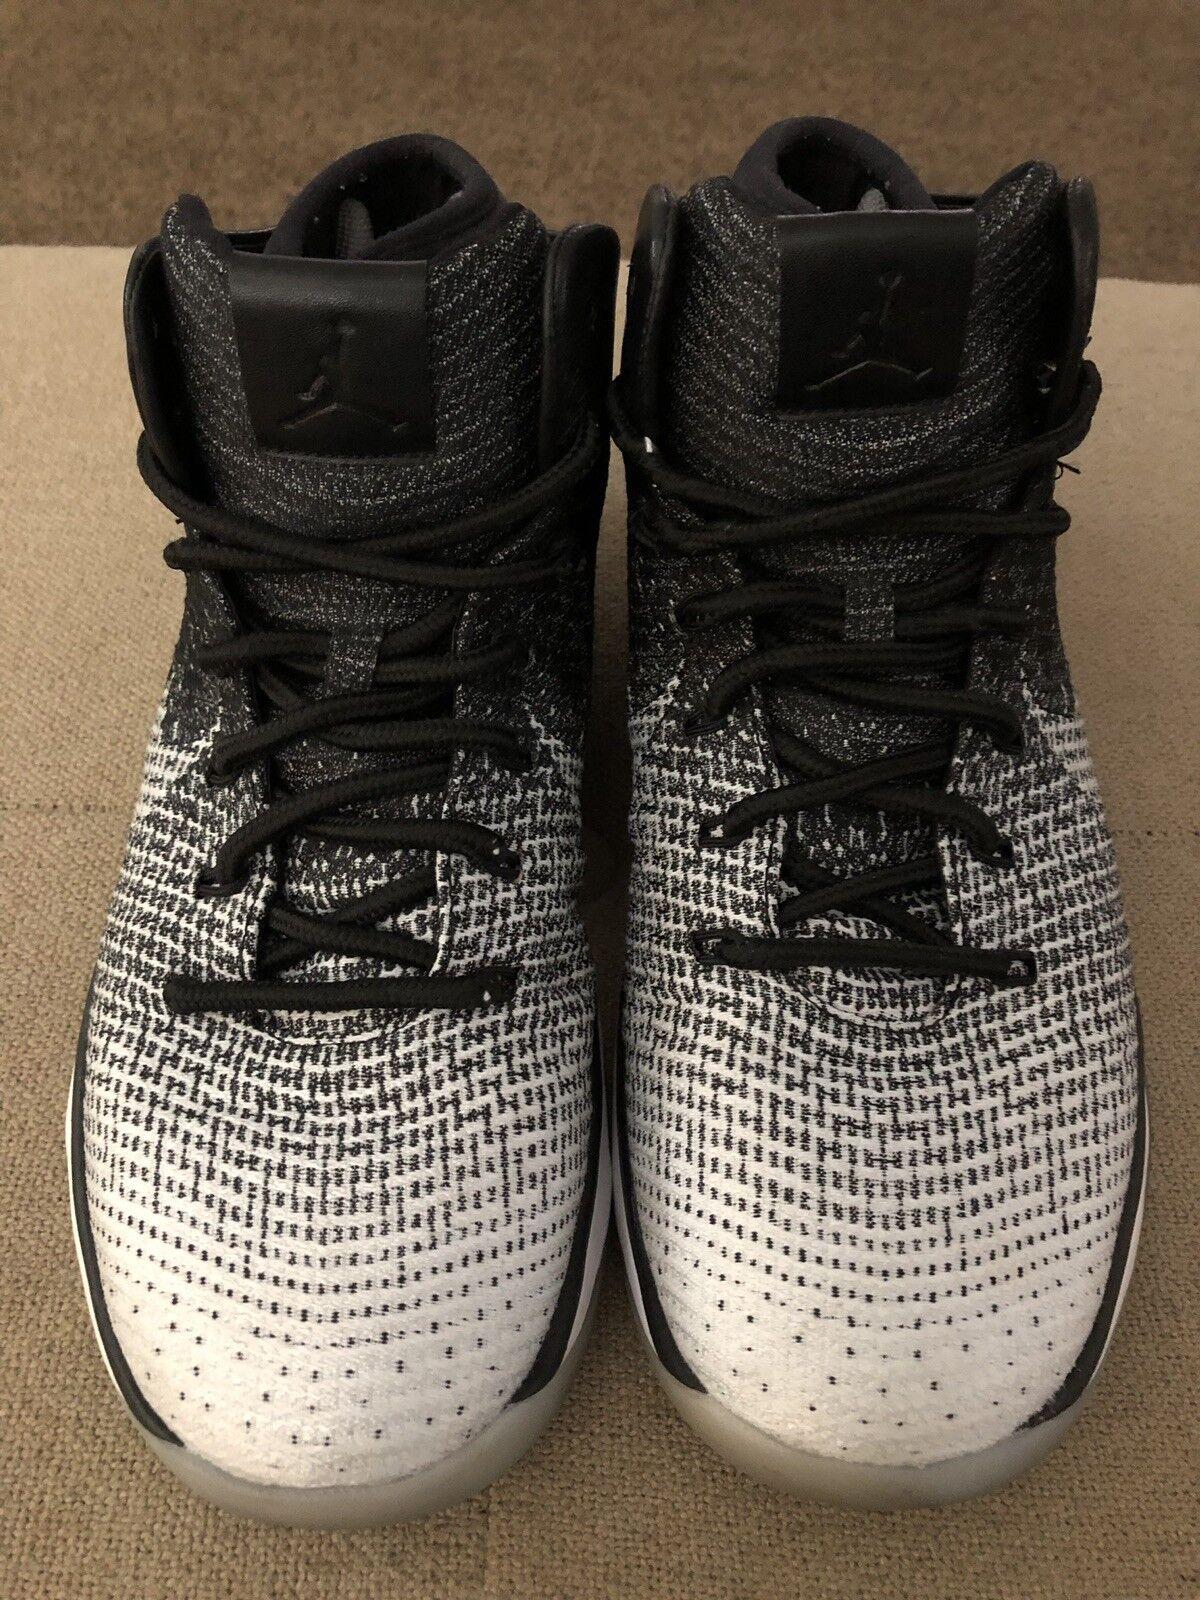 Nike Air Jordan 31 XXXI Fine Print DS Sz 11.5 845037-003